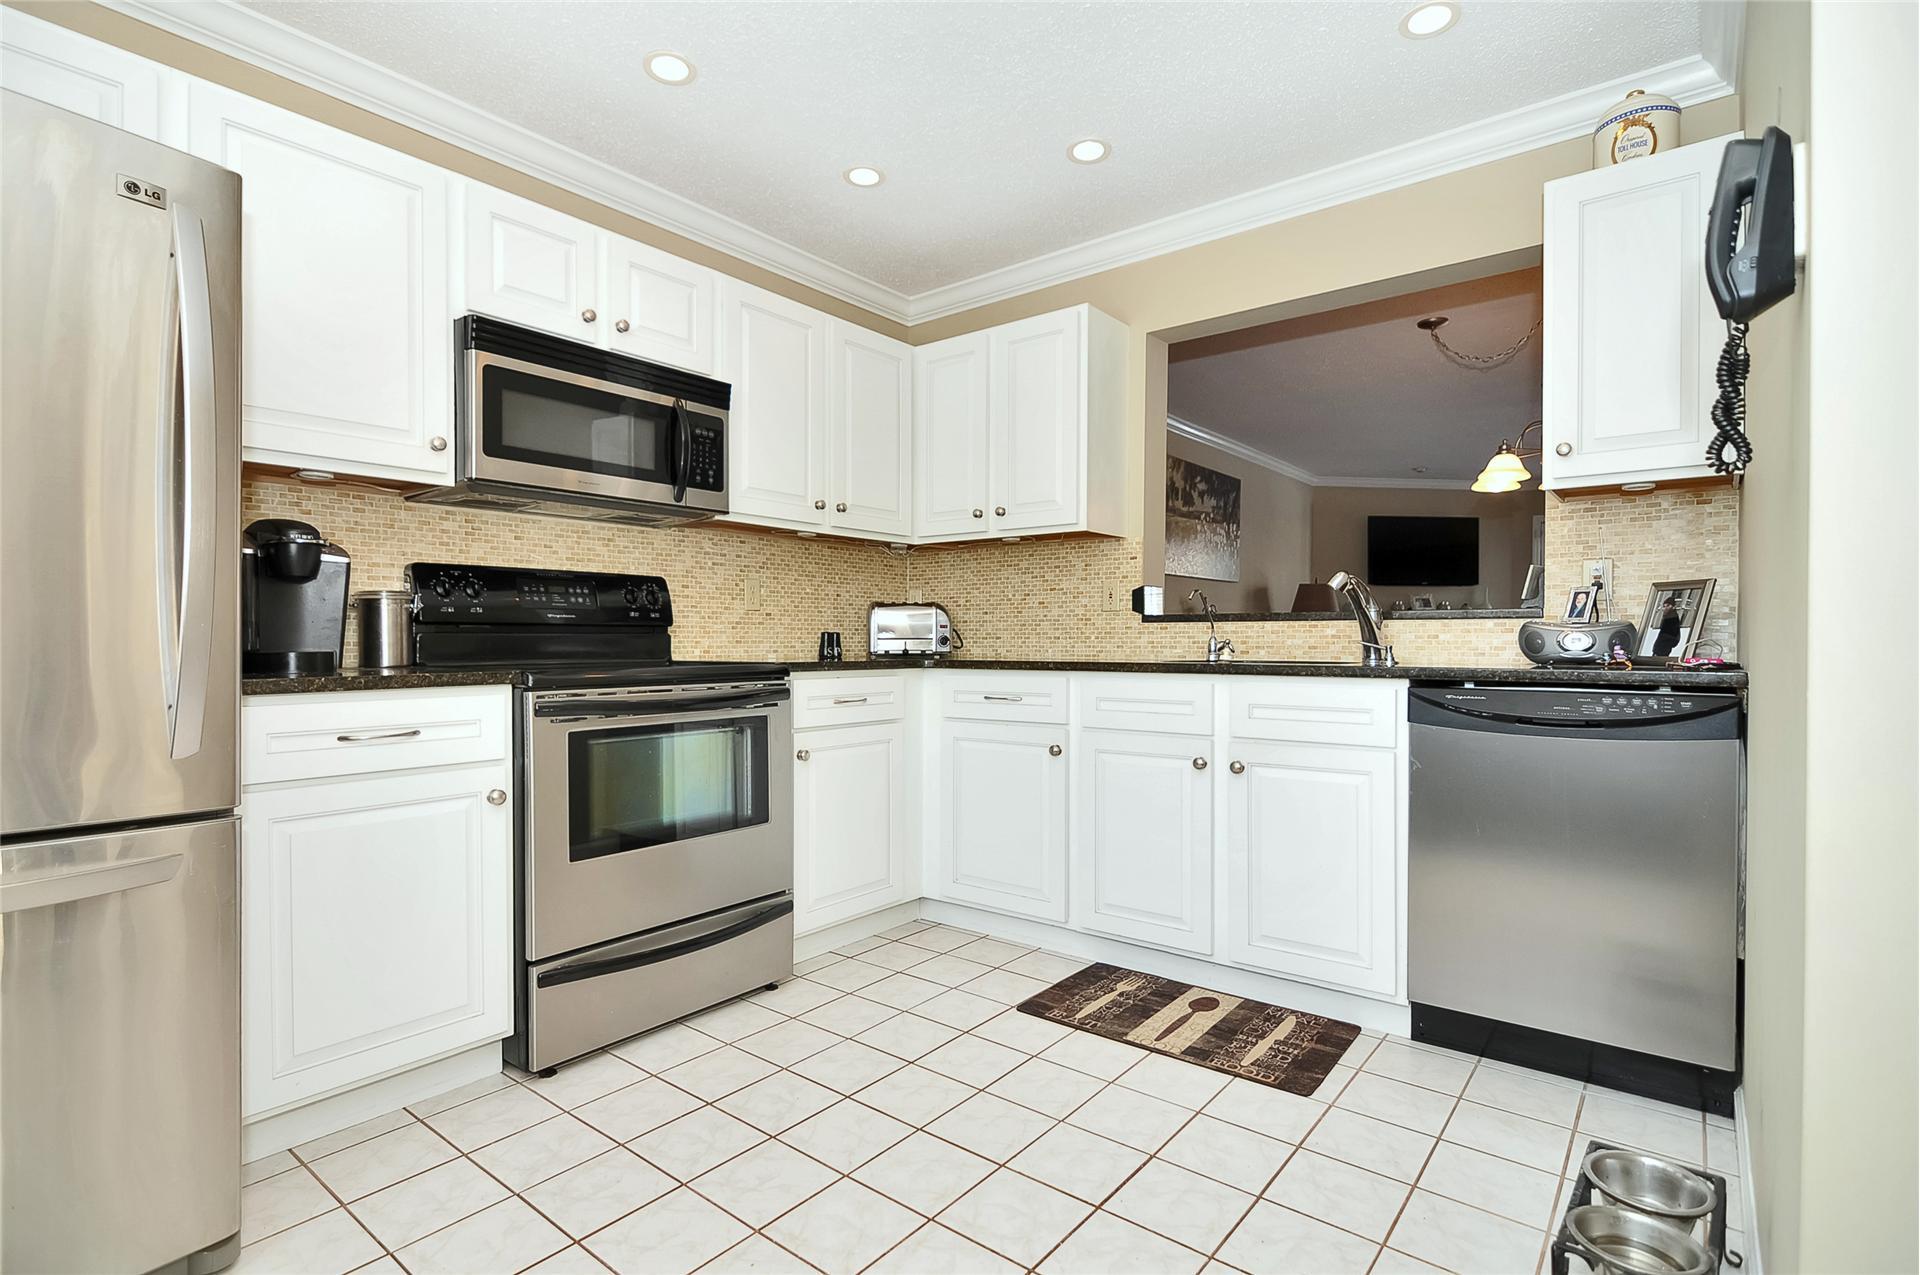 90 Sparrow Ridge Rd, Carmel, NY 10512 - Estimate and Home Details ...